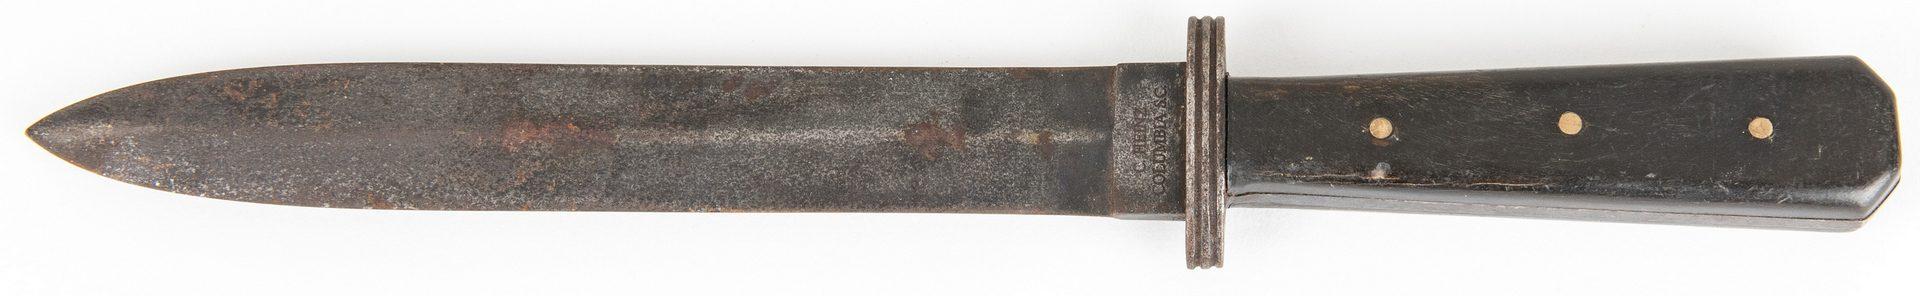 Lot 790: Three (3) 20th Century Reproduction CSA Style Knives